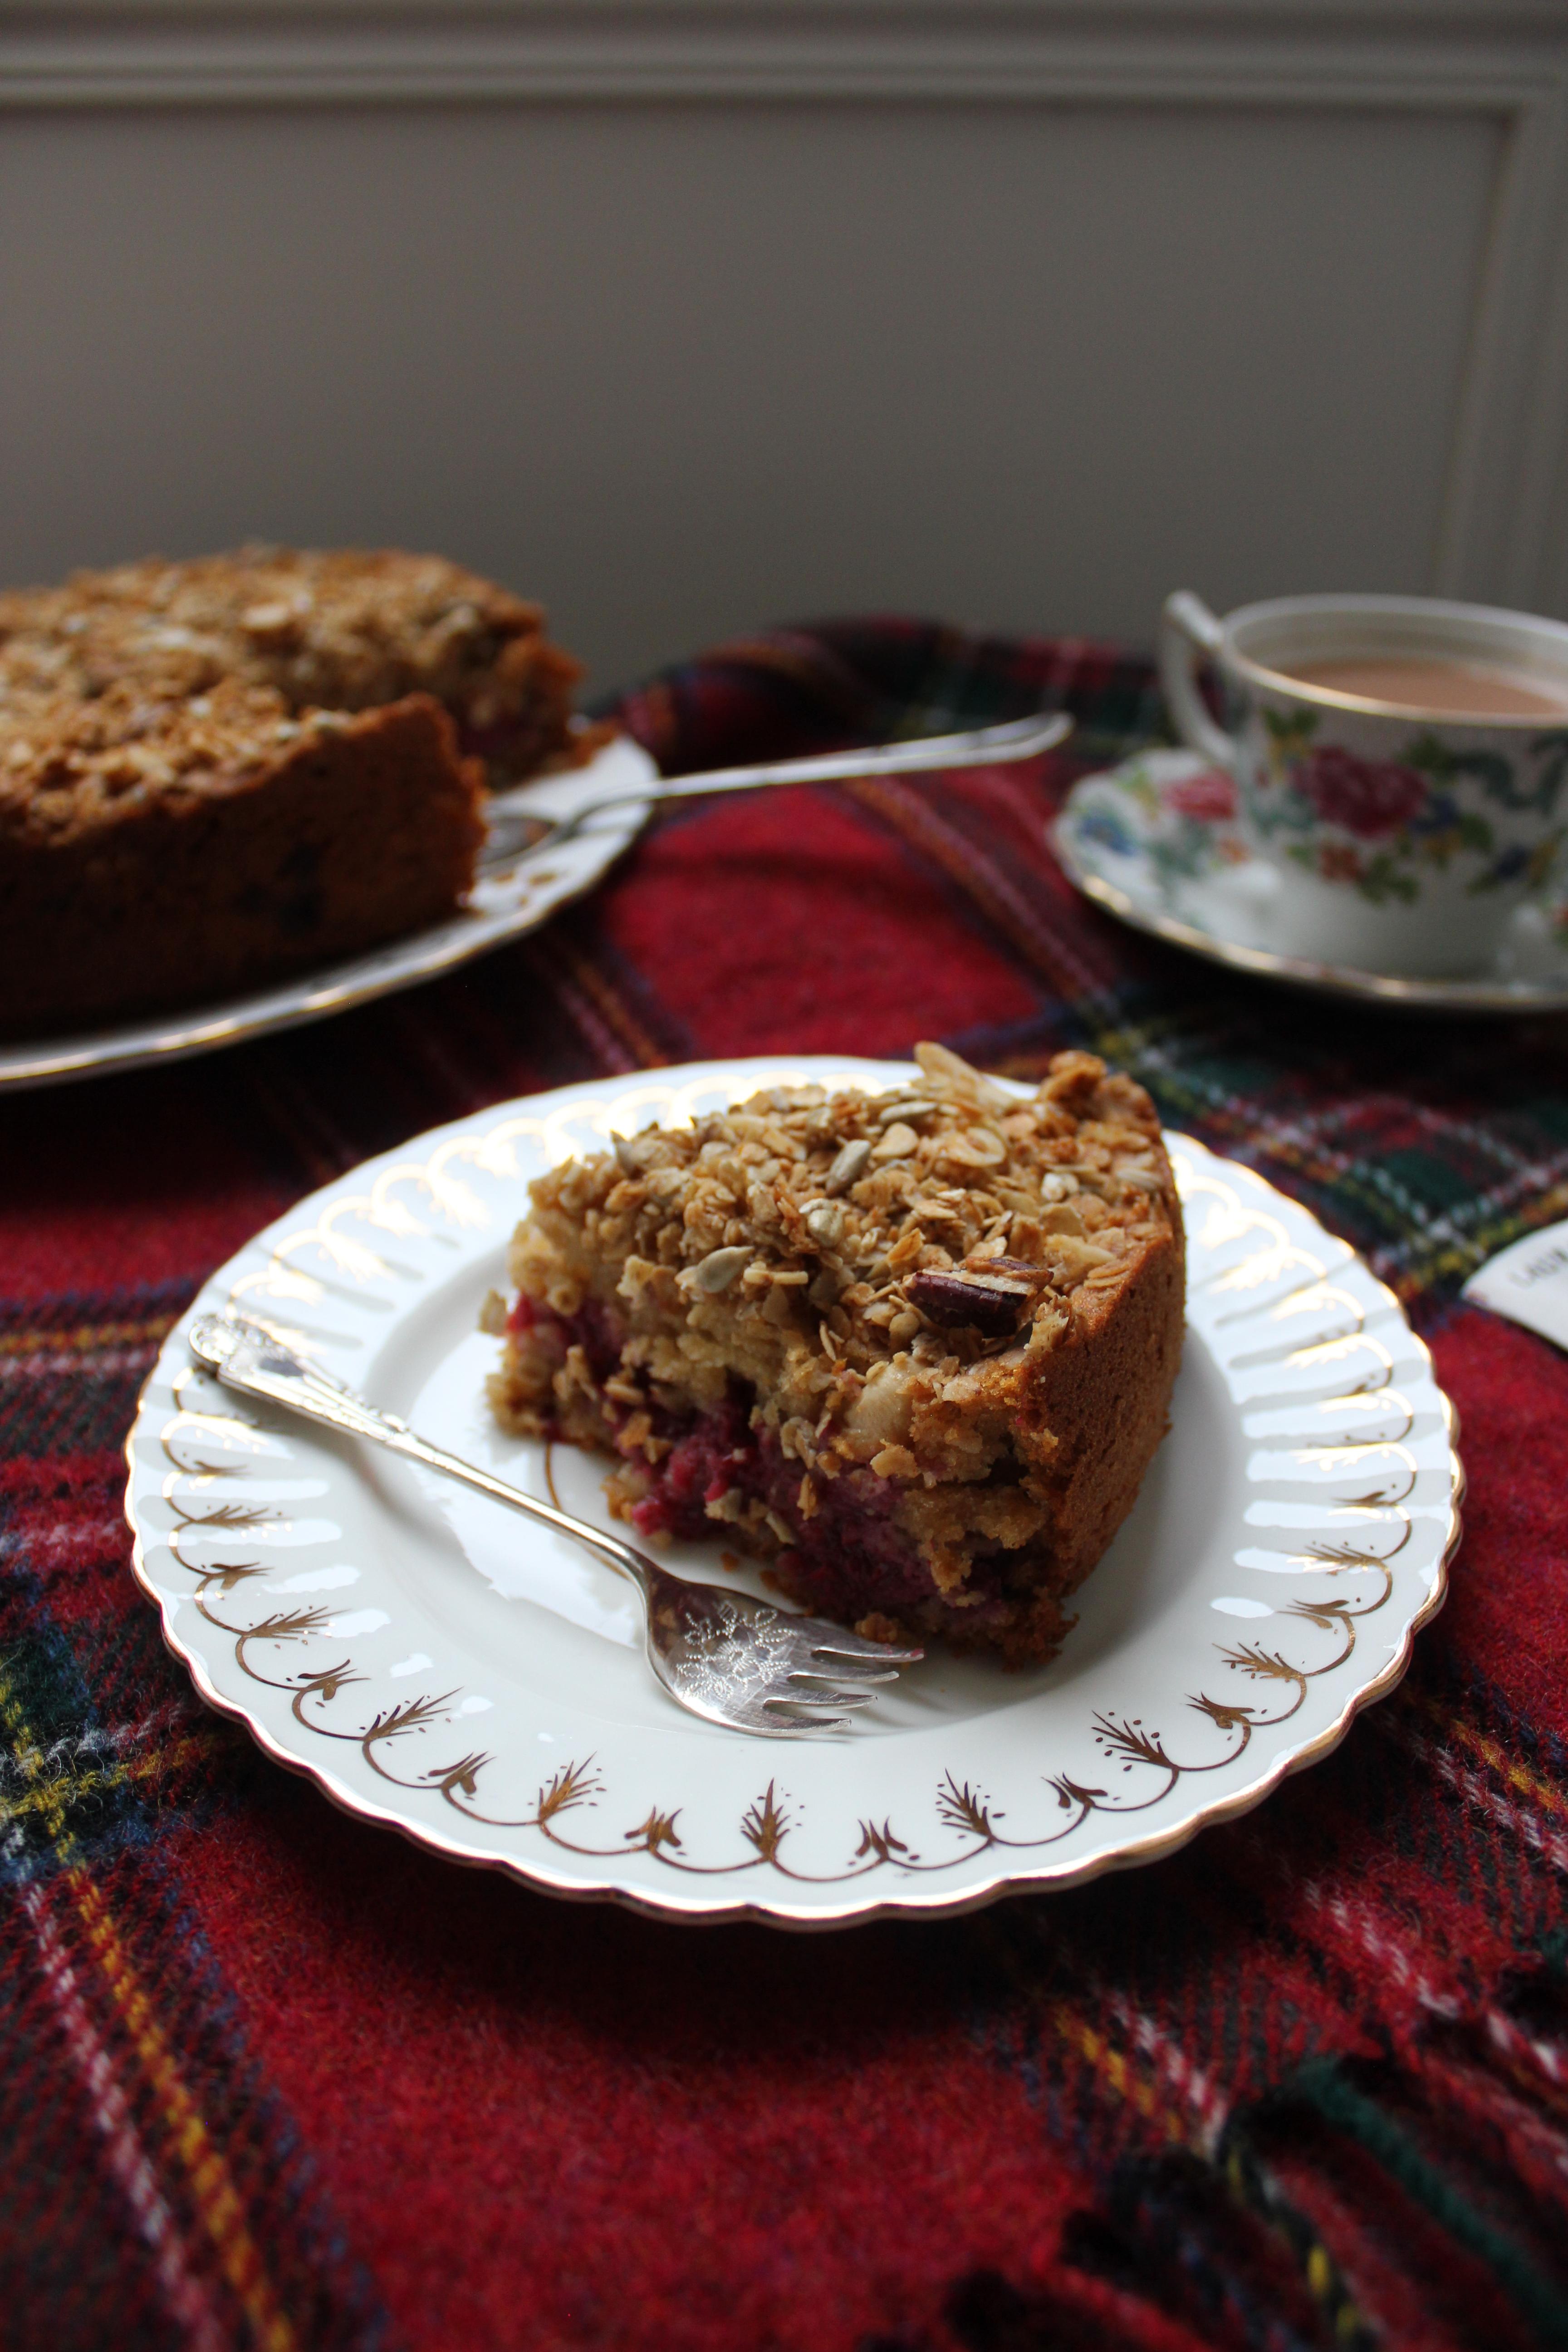 Cranachan cake